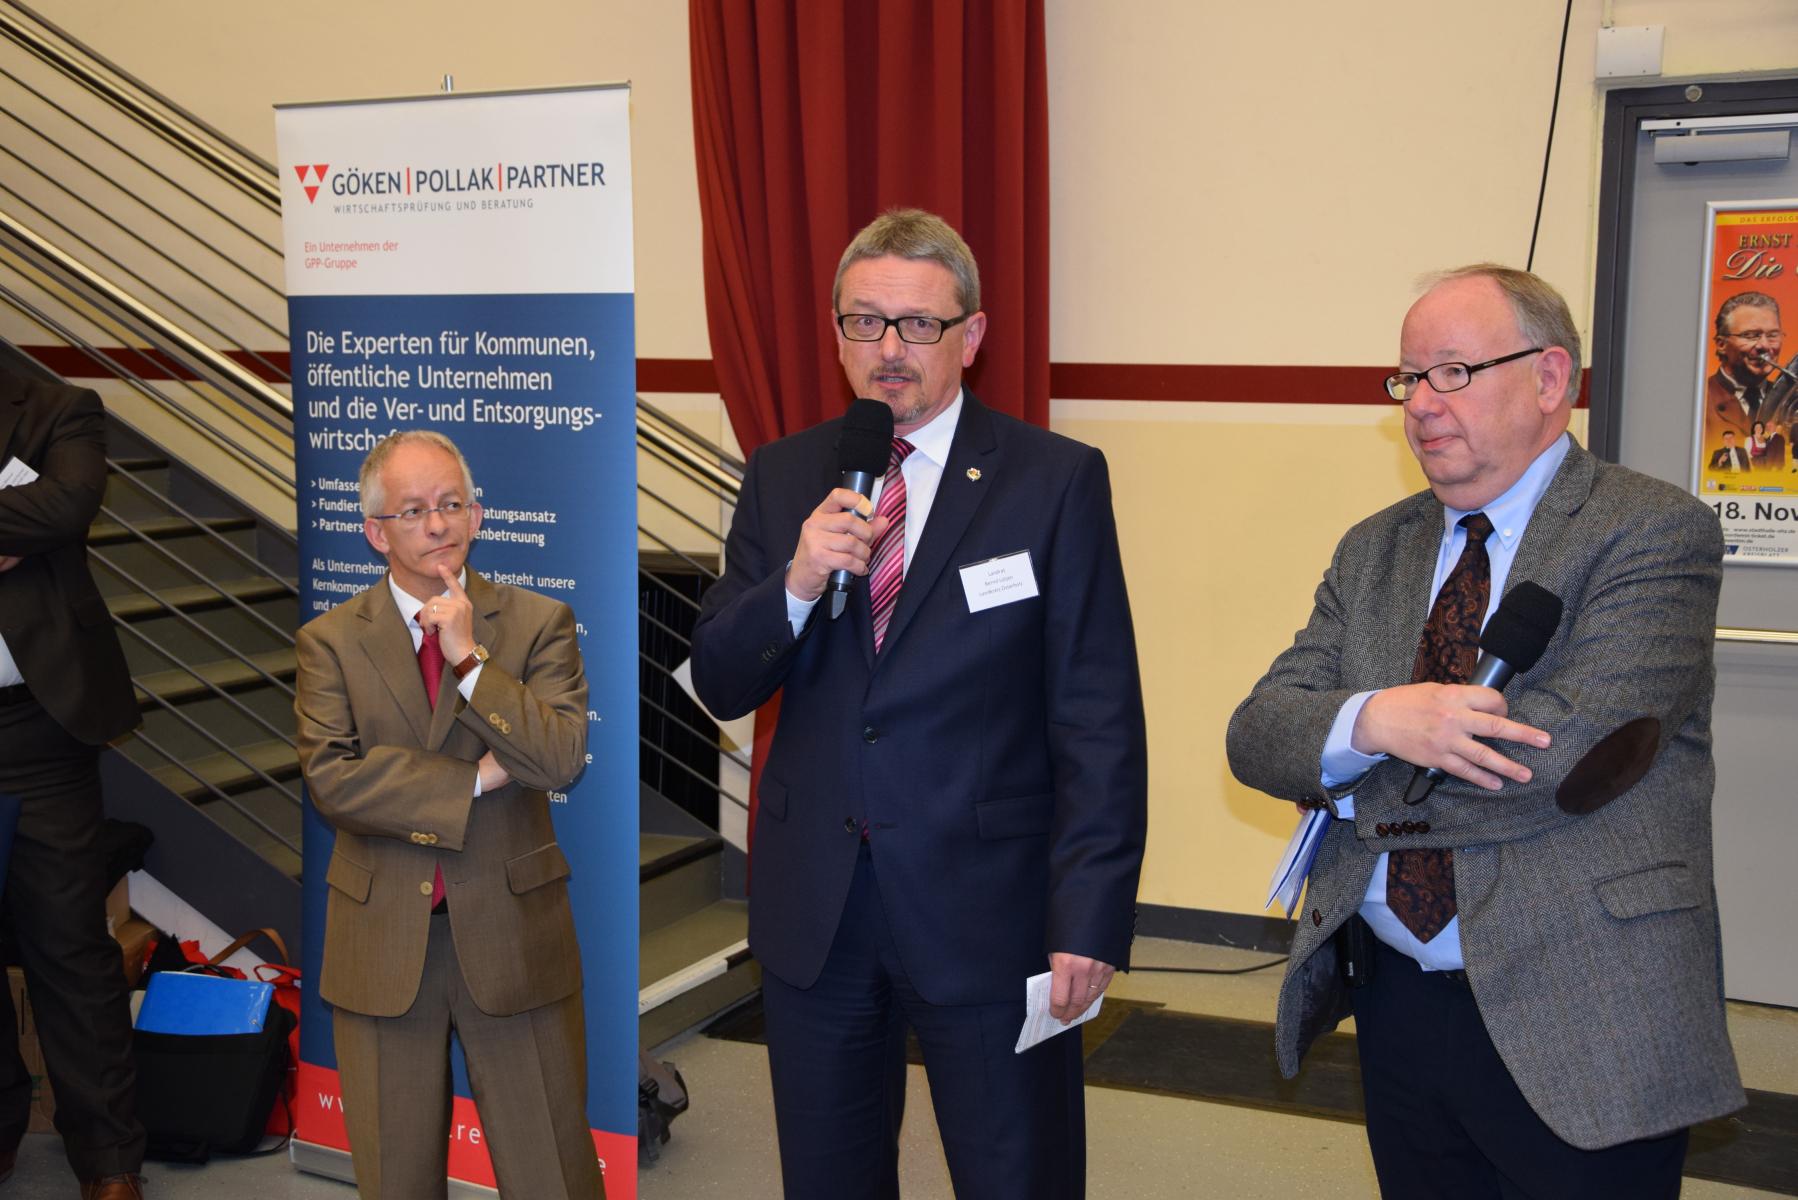 Kommunaler Breitbandmarktplatz (2017) mit Staatssekretär Dr. Jörg Mielke